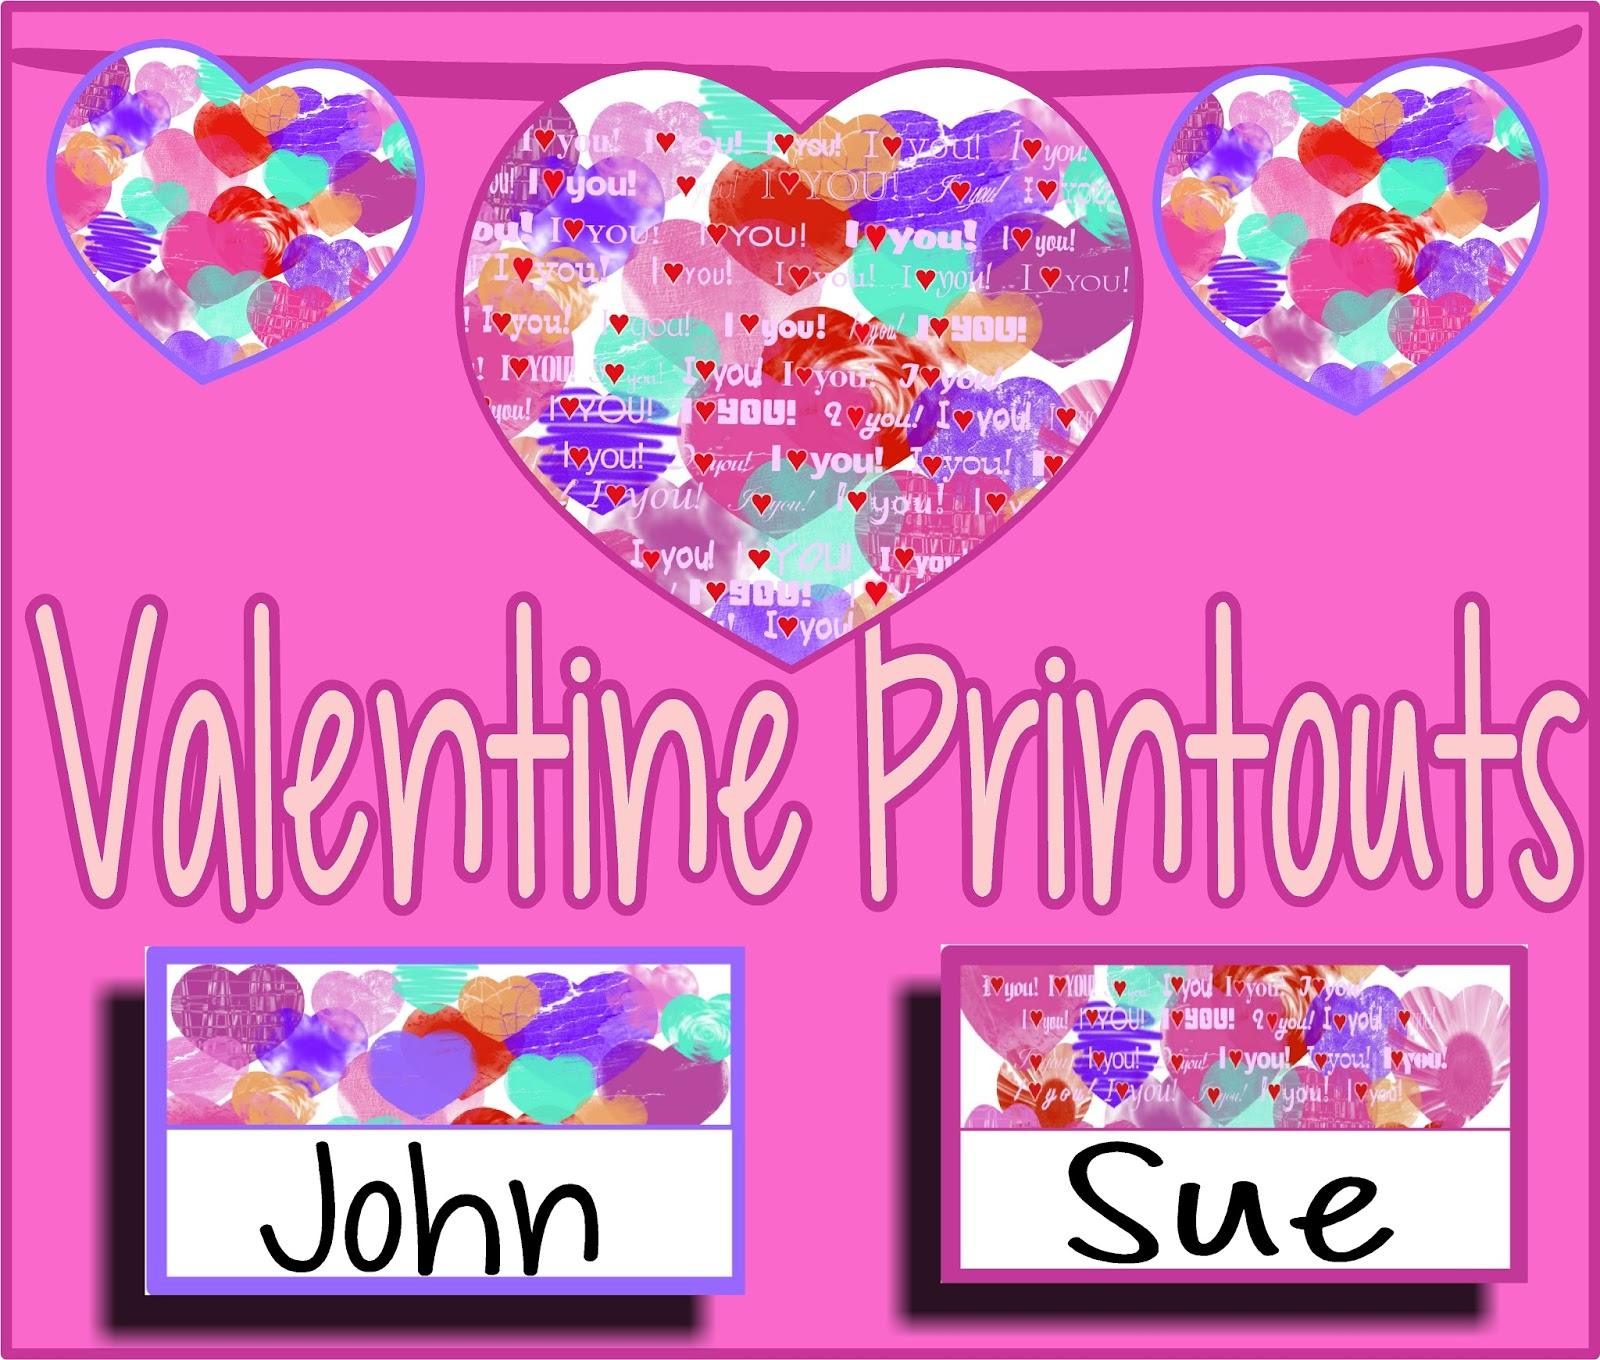 http://hollyshome-hollyshome.blogspot.com/2014/01/scattered-hearts-i-heart-you-valentines.html